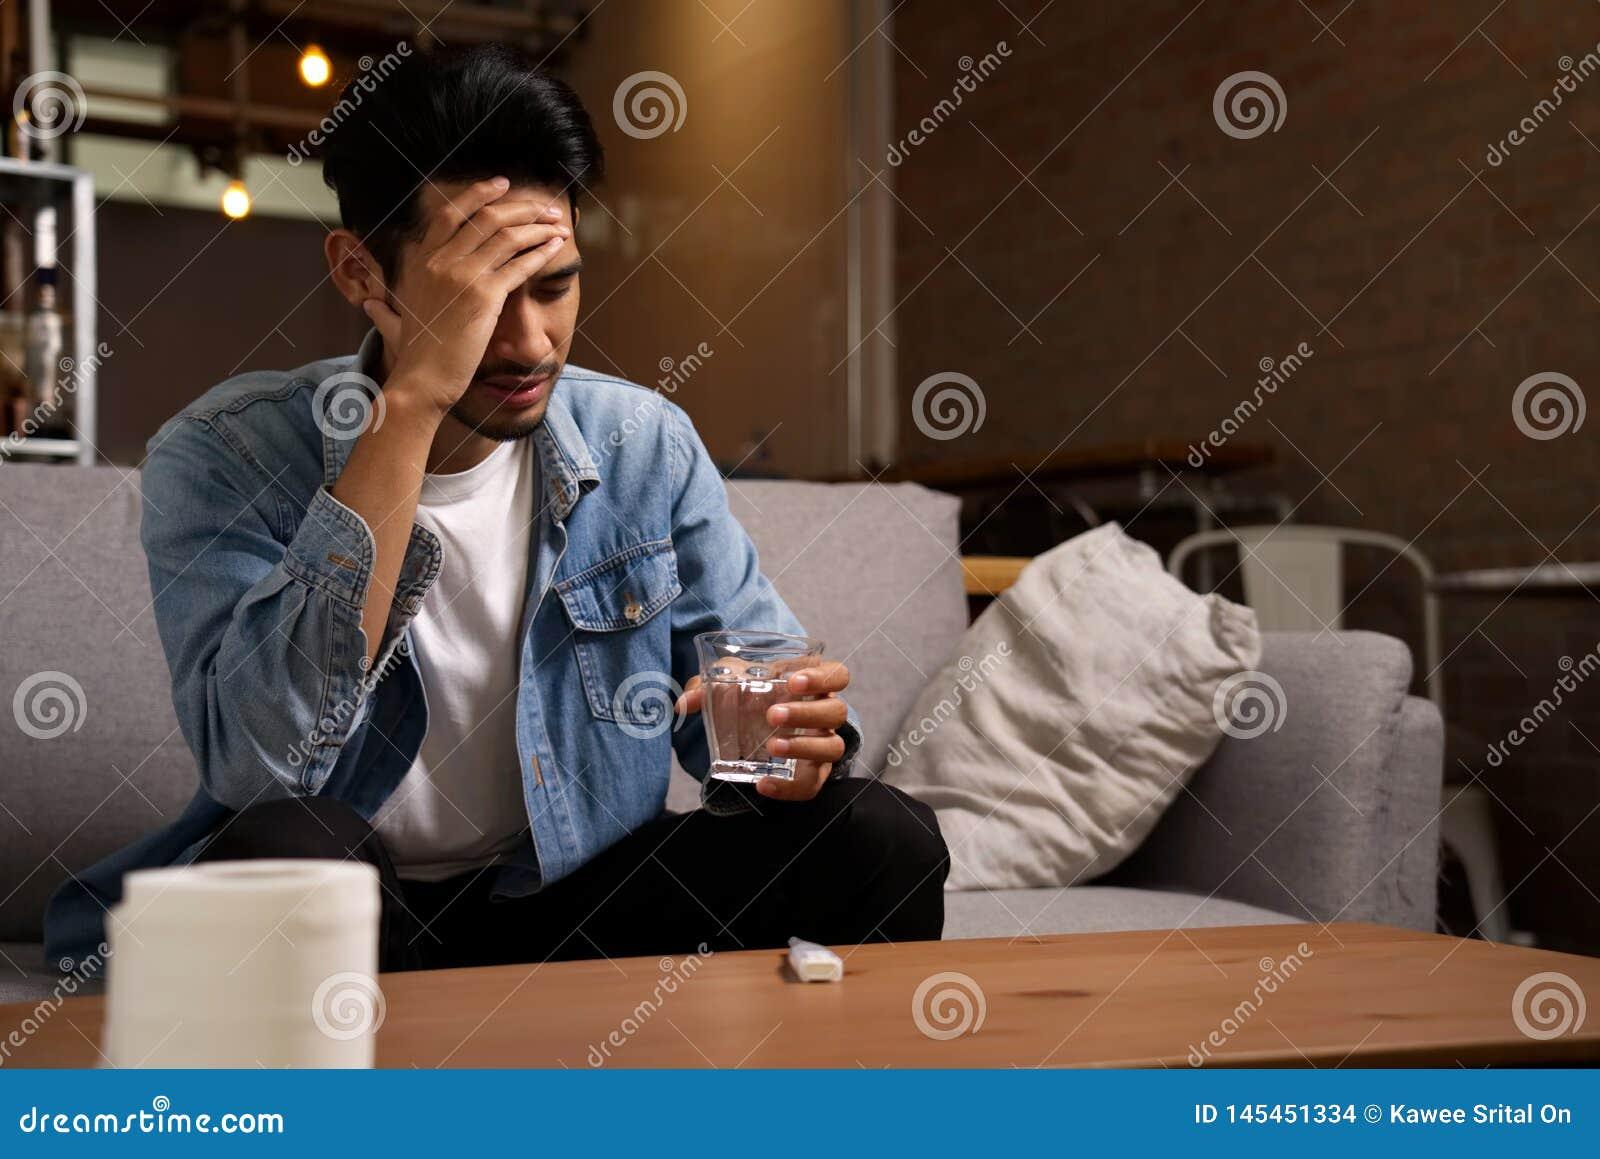 Illness and unhealthy condition concept. Headache man sitting on sofa.